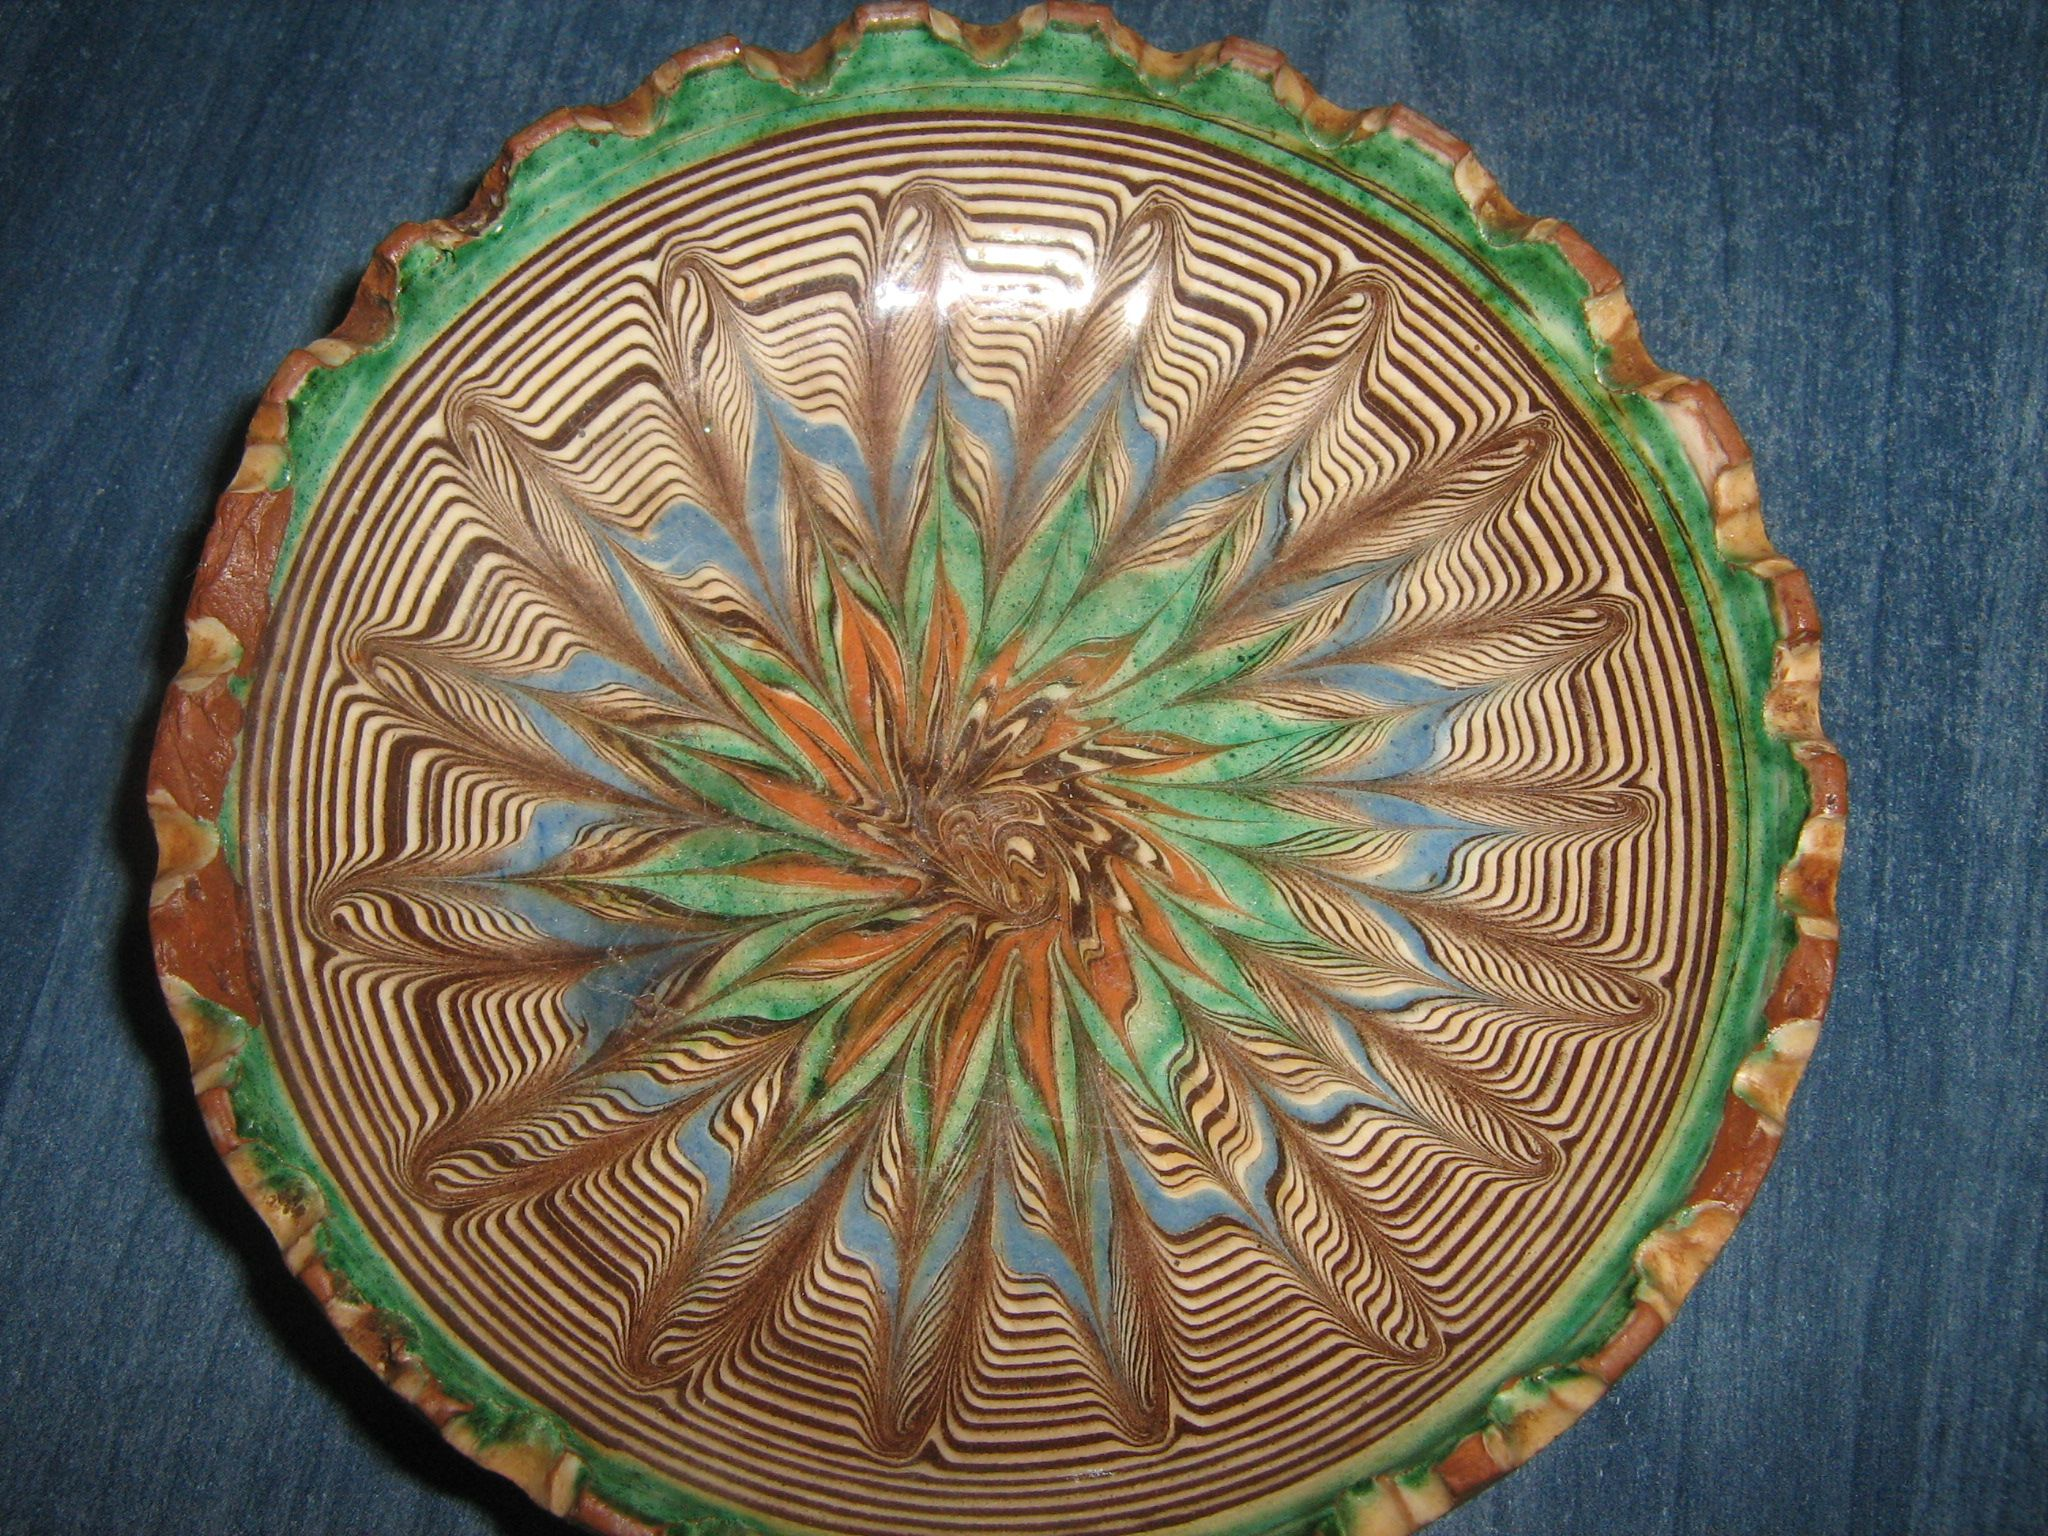 decorative tiles - Google Search & decorative tiles - Google Search | Pottery | Pinterest | Pottery